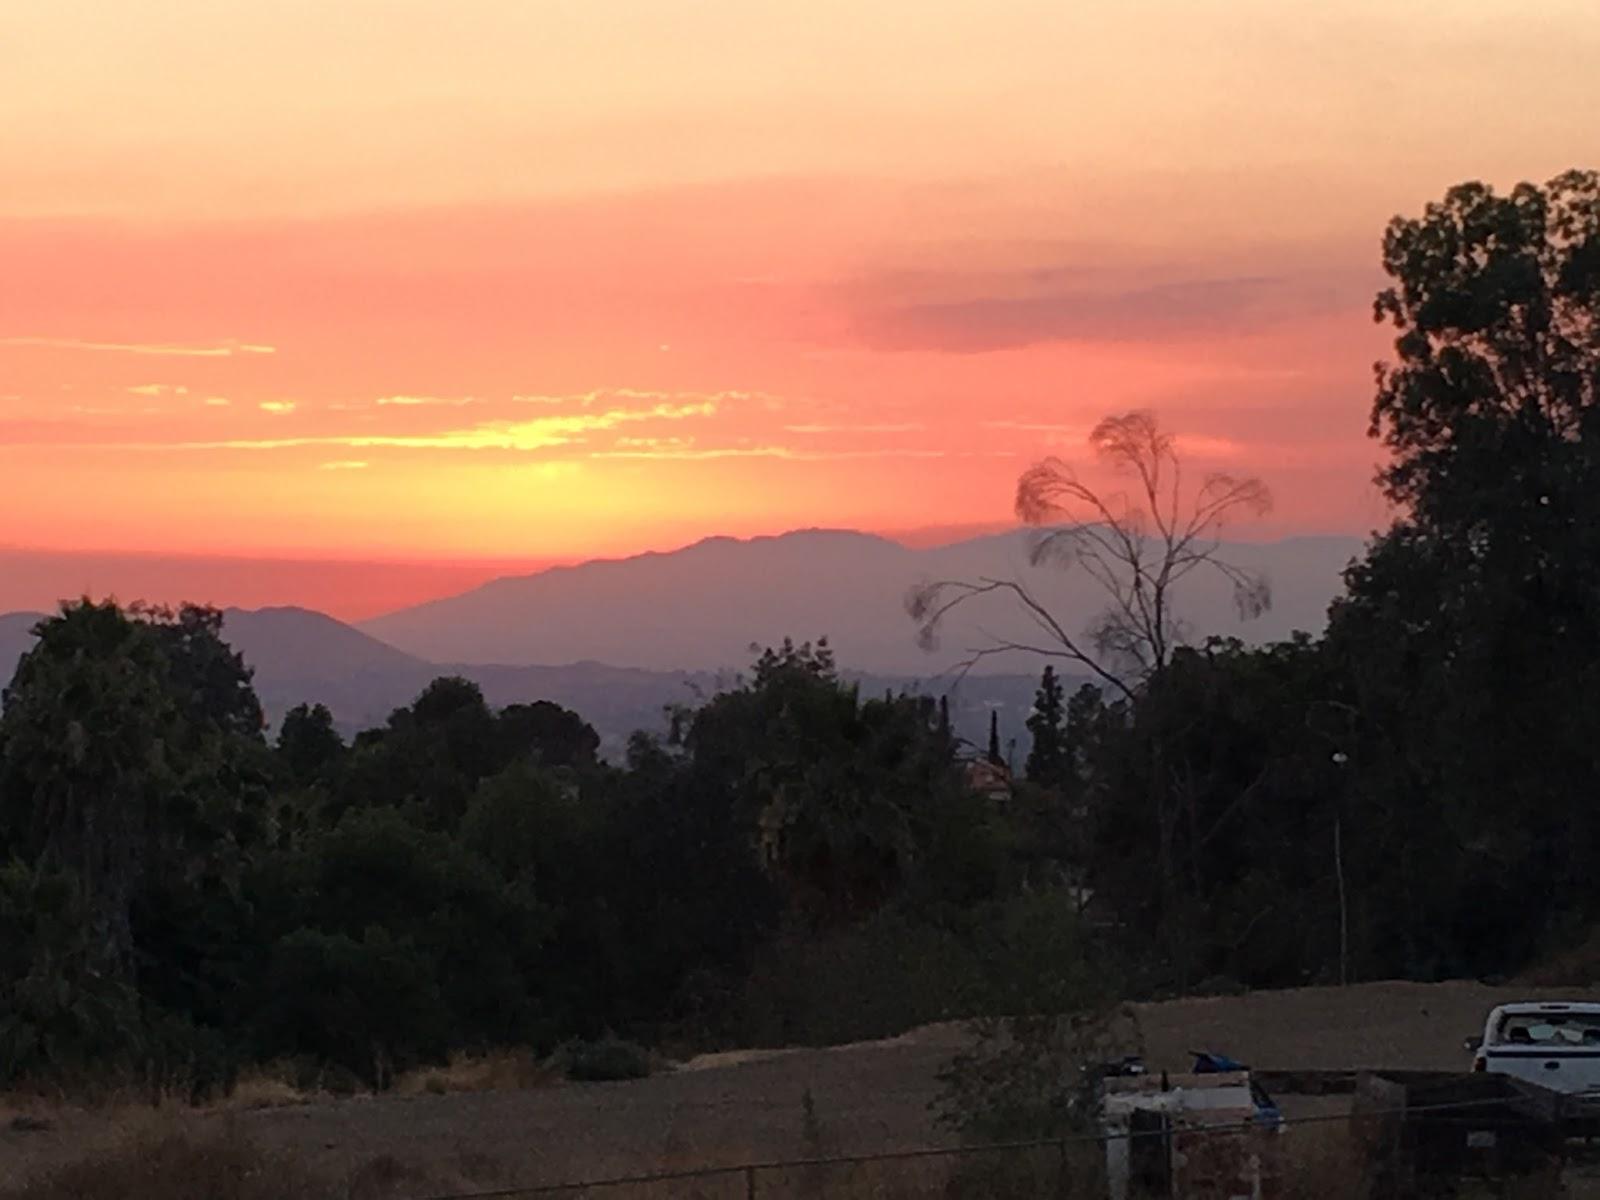 california riverside mission 2017 2020 july 2017